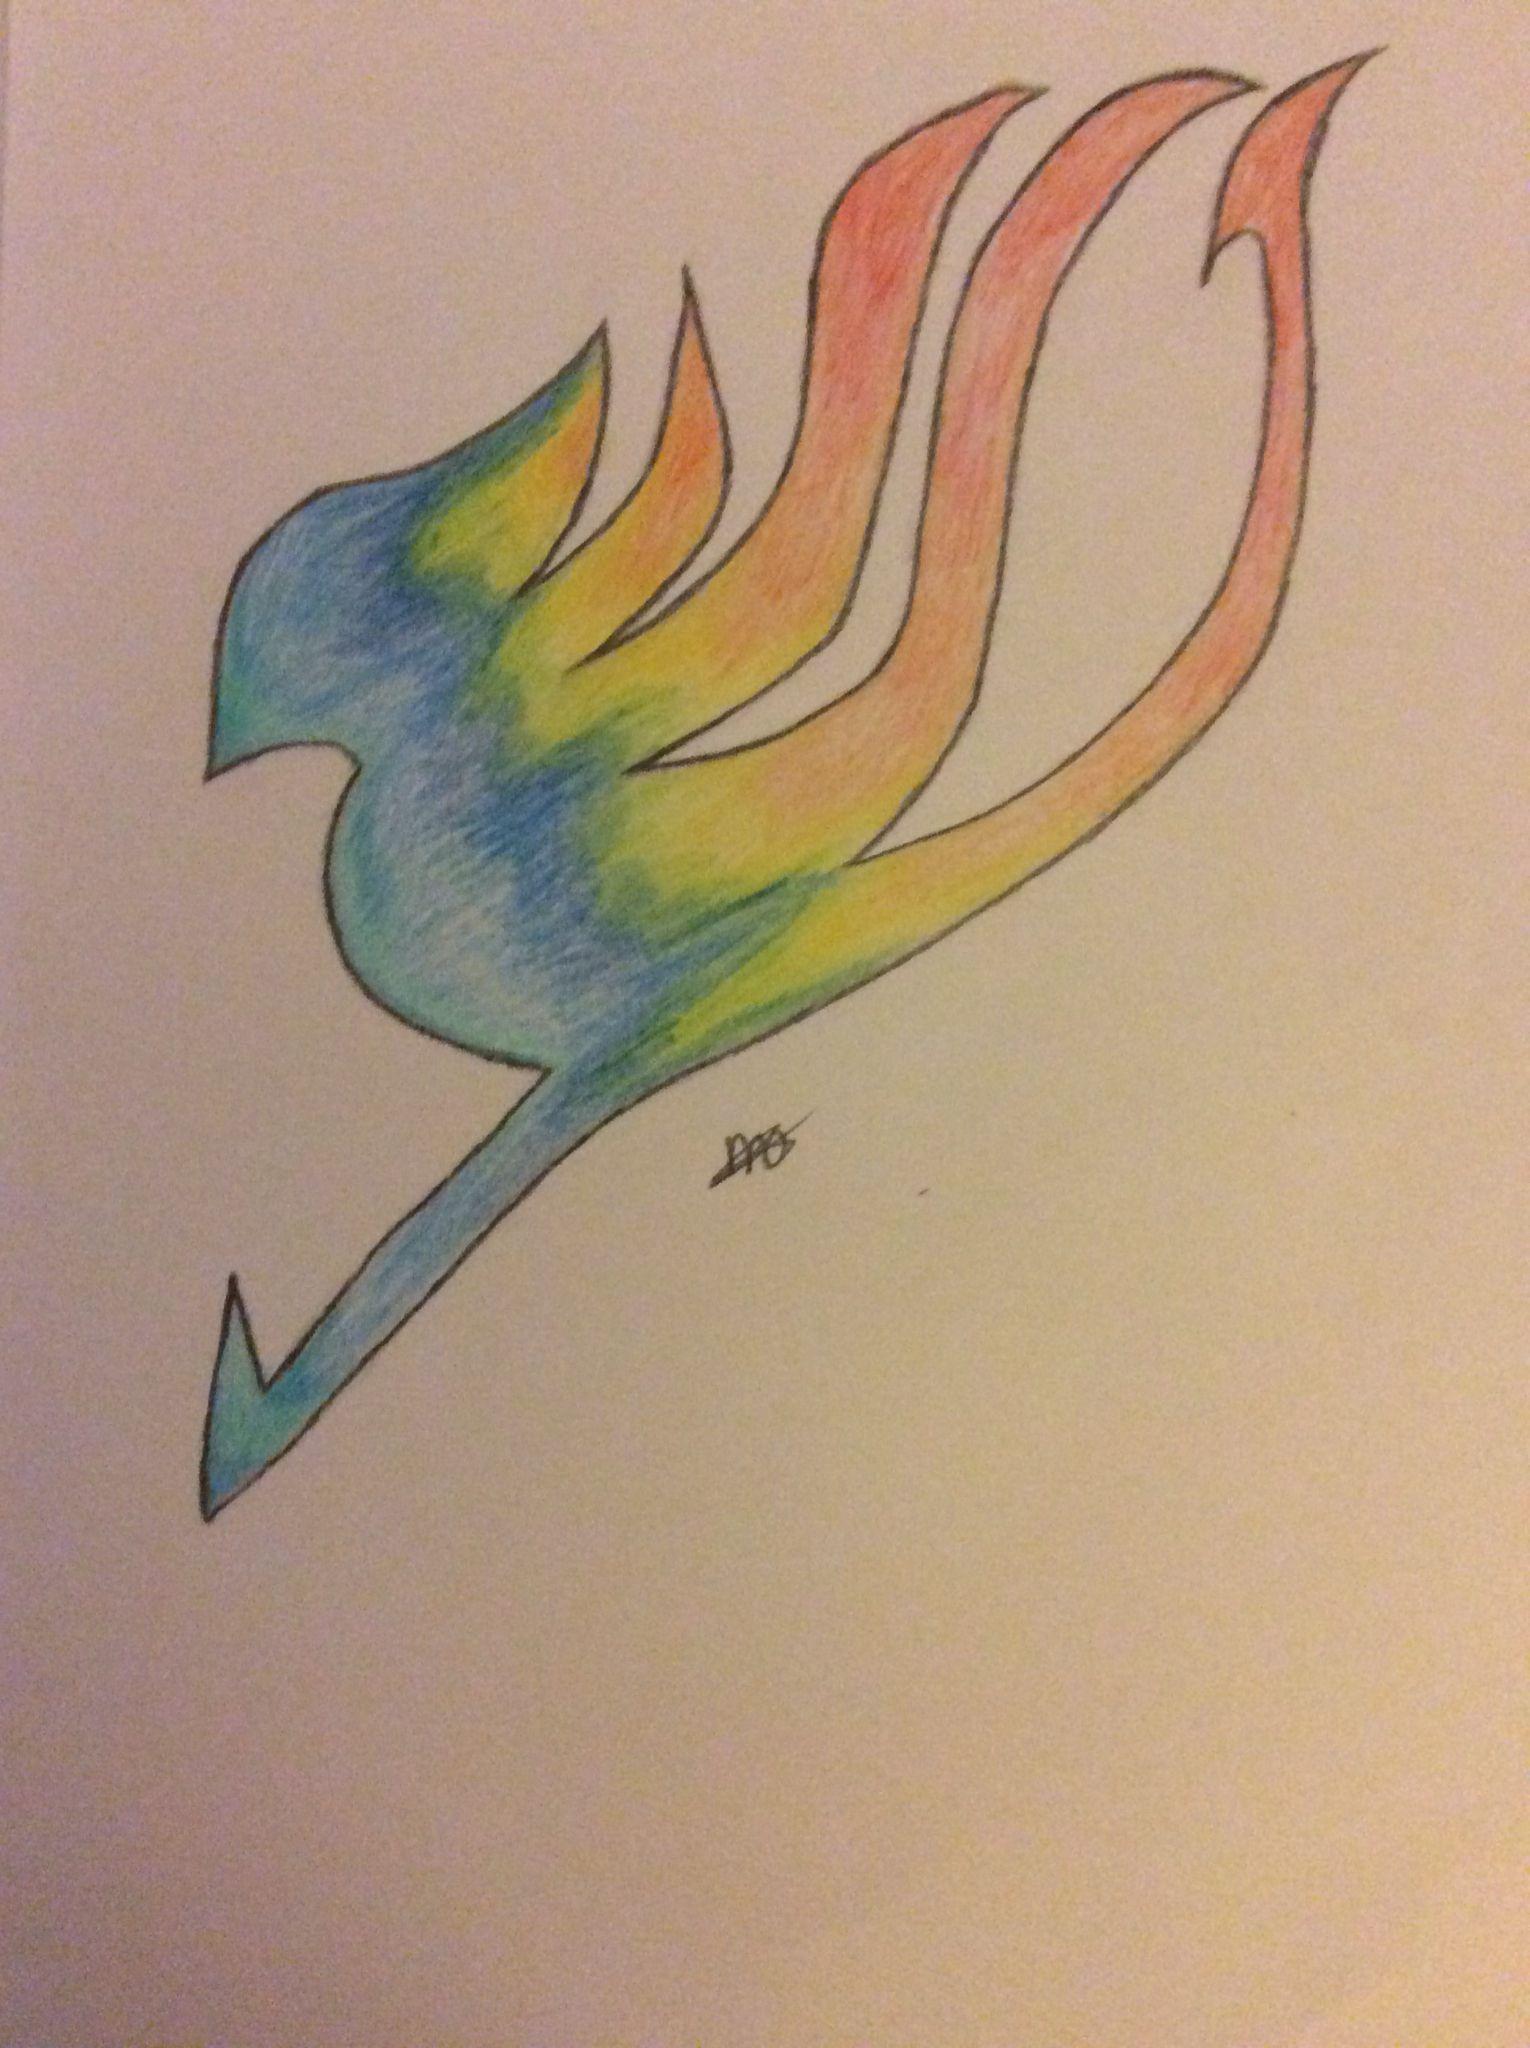 Fairytail logo